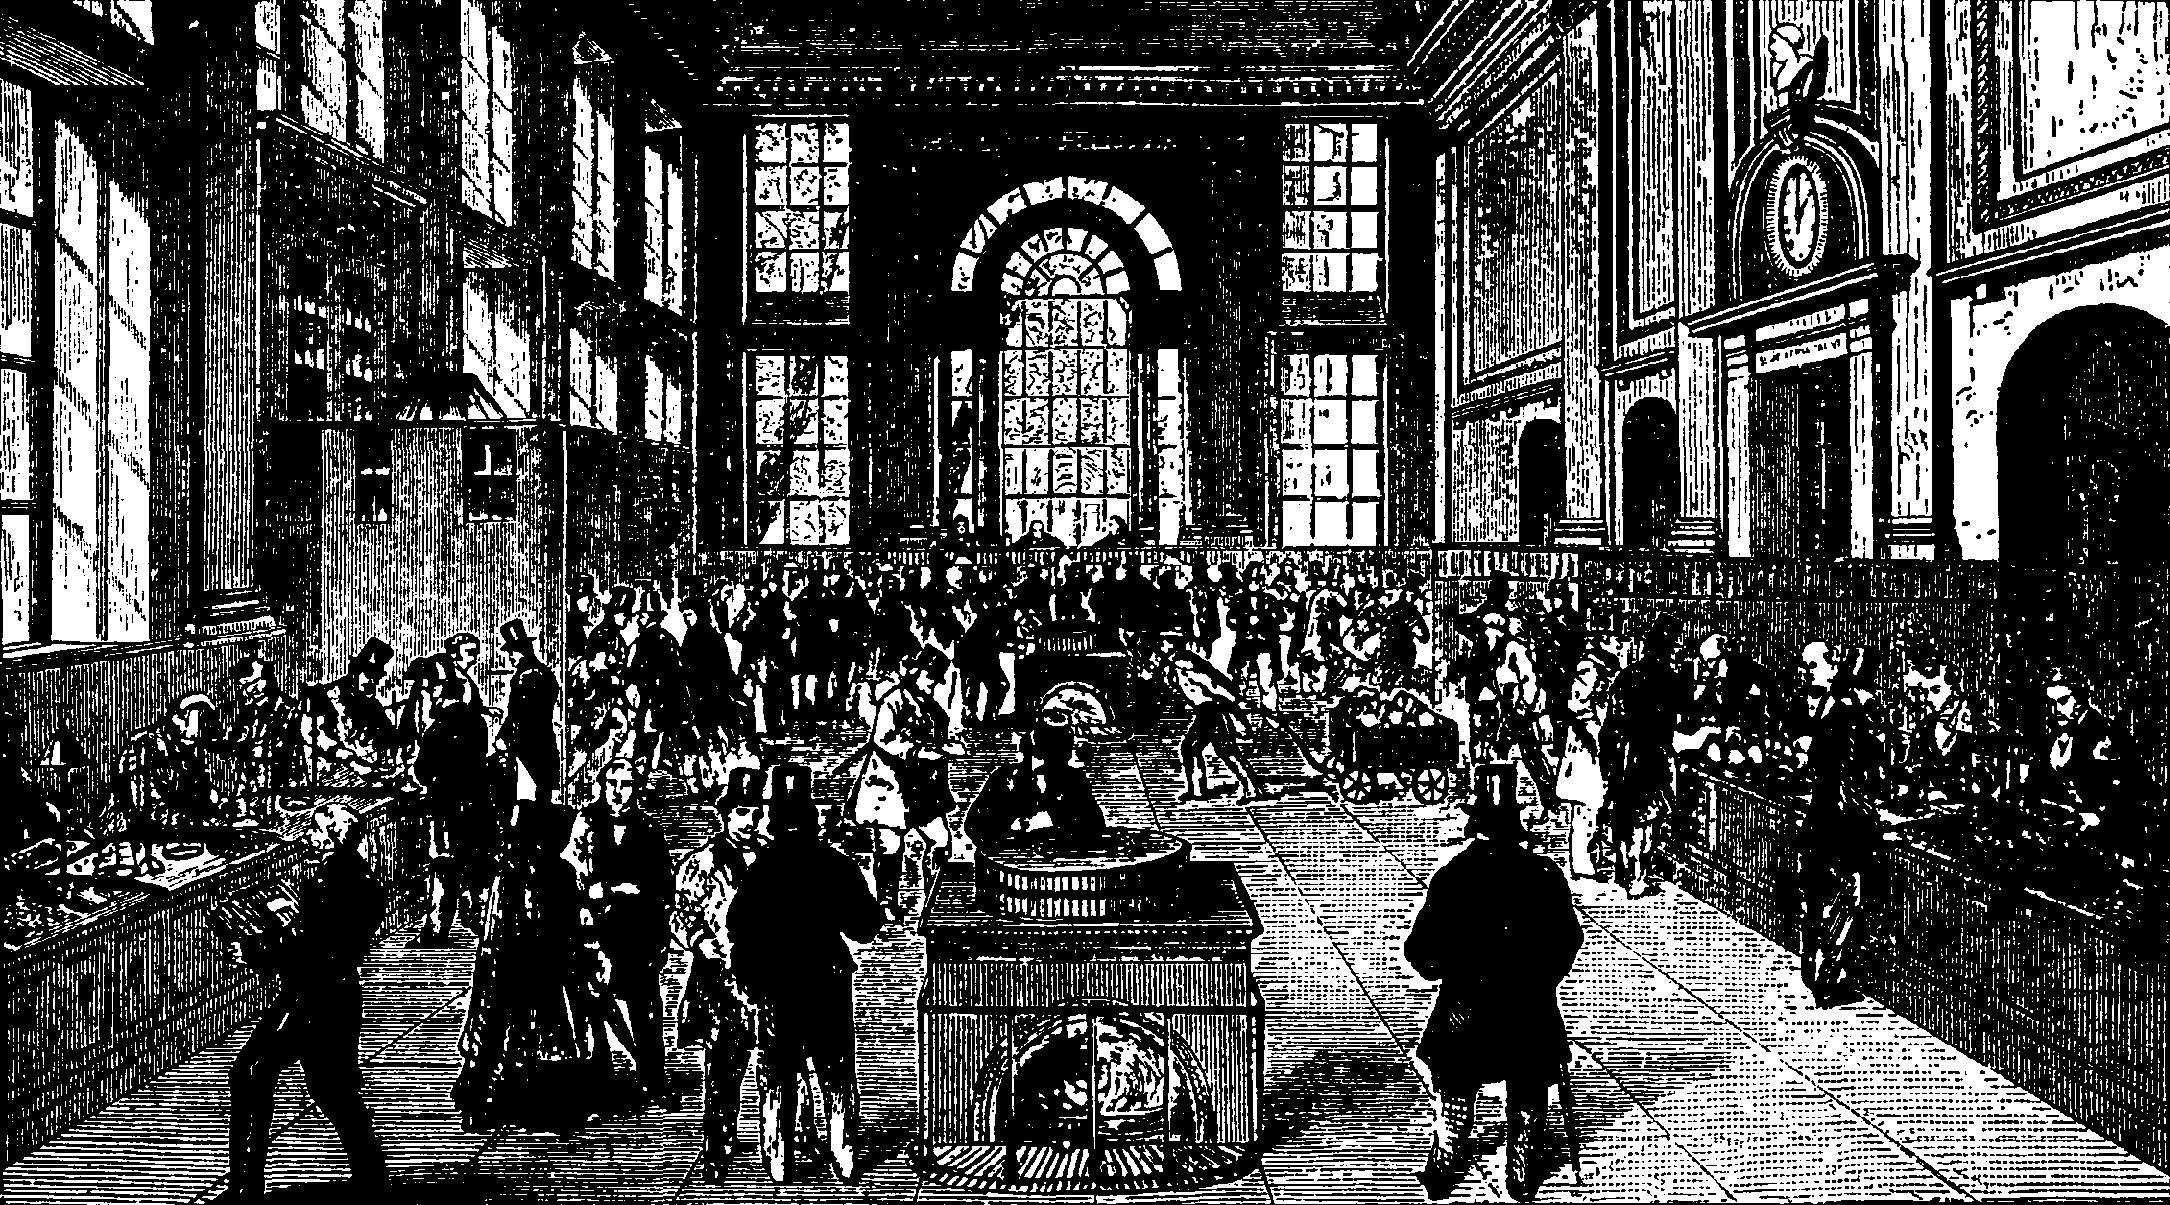 File:Bank, Interiör från Bank of England vid midten af 1800-talet,